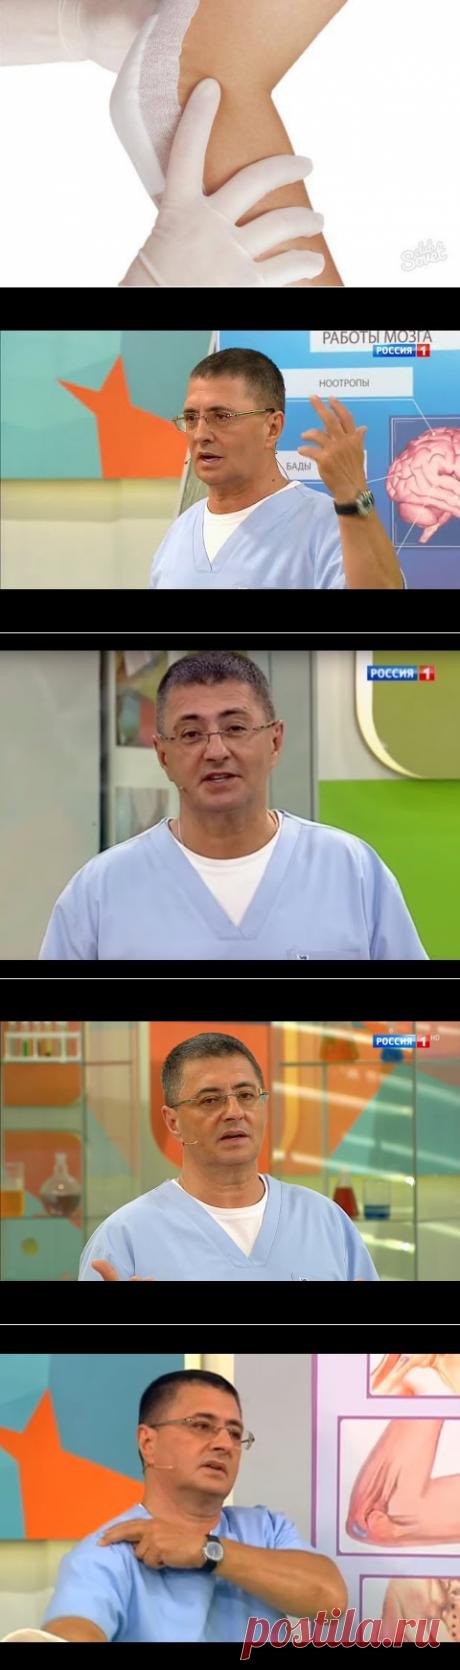 доктор мясников | Nataly Kuznetsova | Фотографии и советы на Постиле